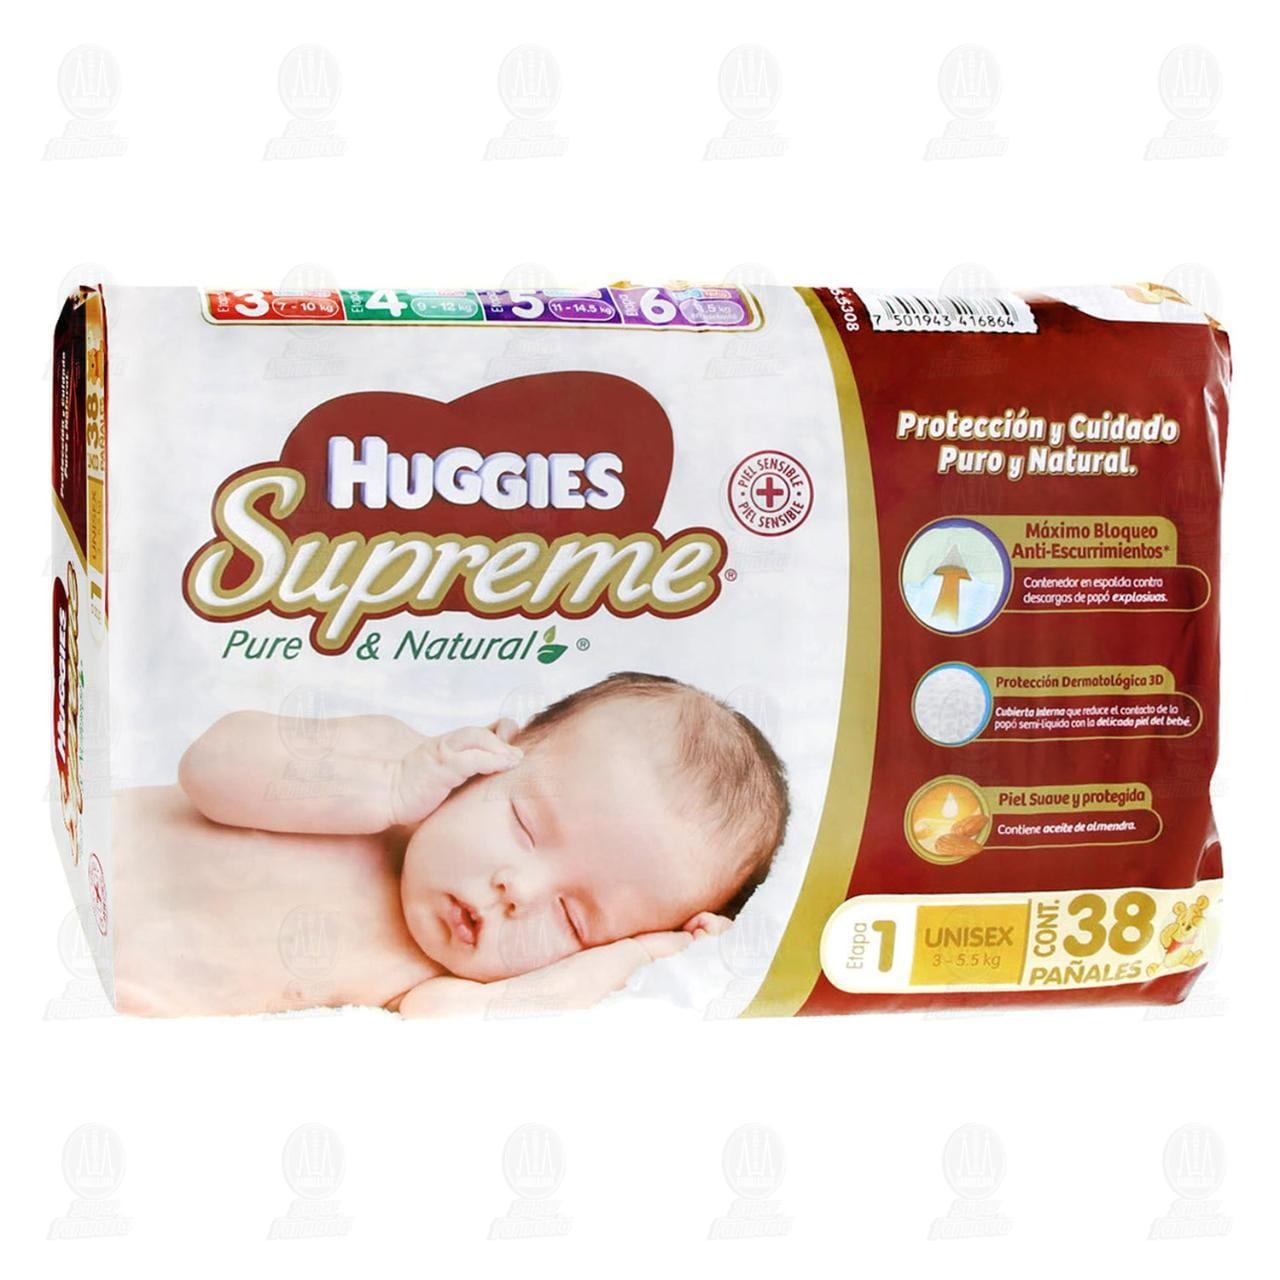 Comprar Pañales Huggies Supreme Etapa 1 Unisex, 38 pzas. en Farmacias Guadalajara